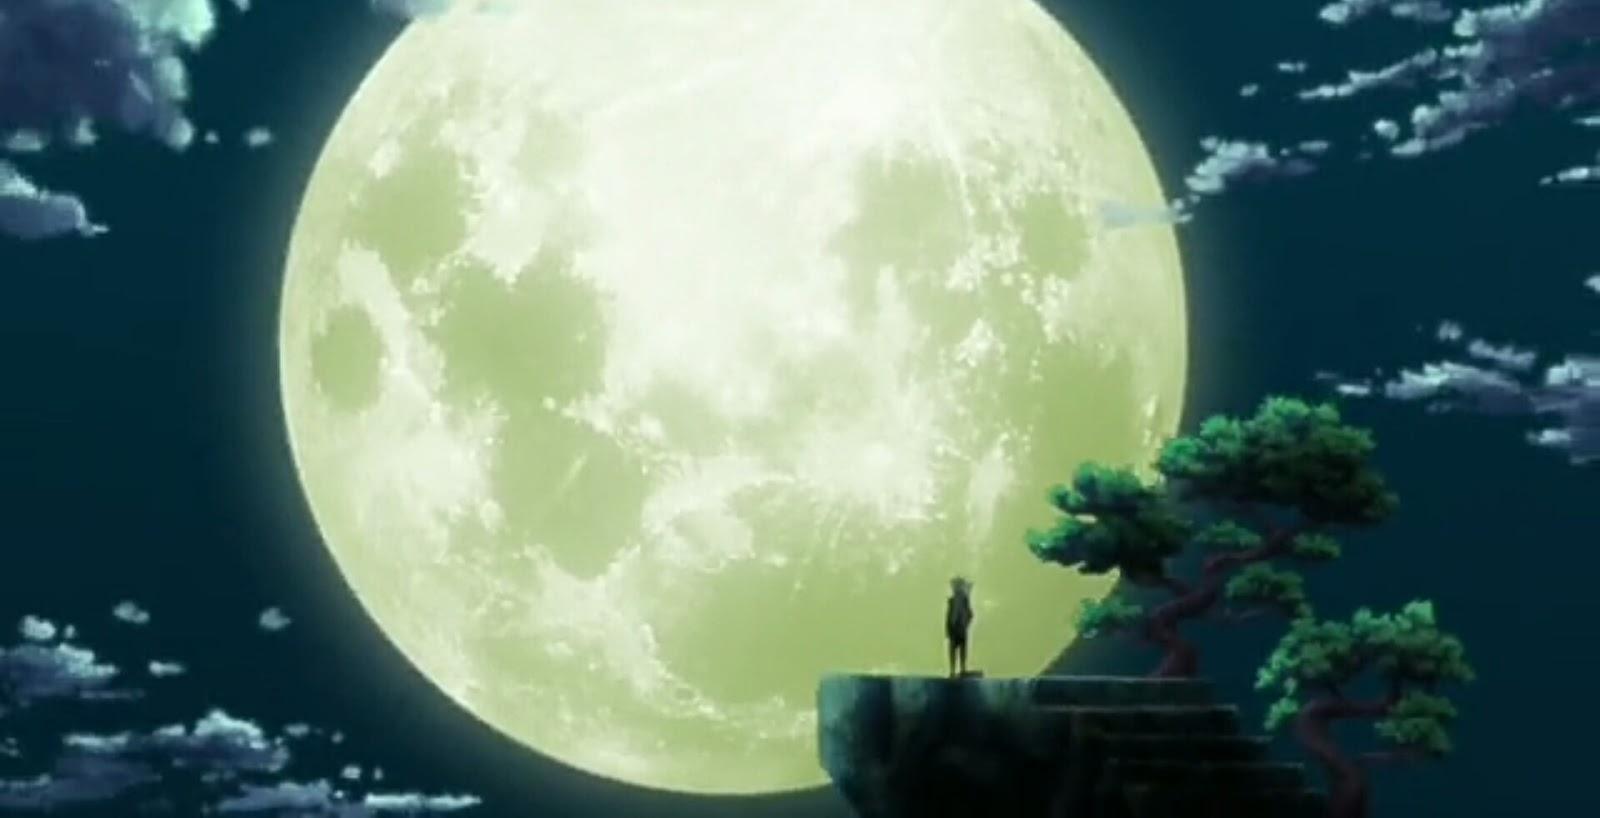 kata-kata mutiara Anime Boruto Episode 39 yang berjudul ...